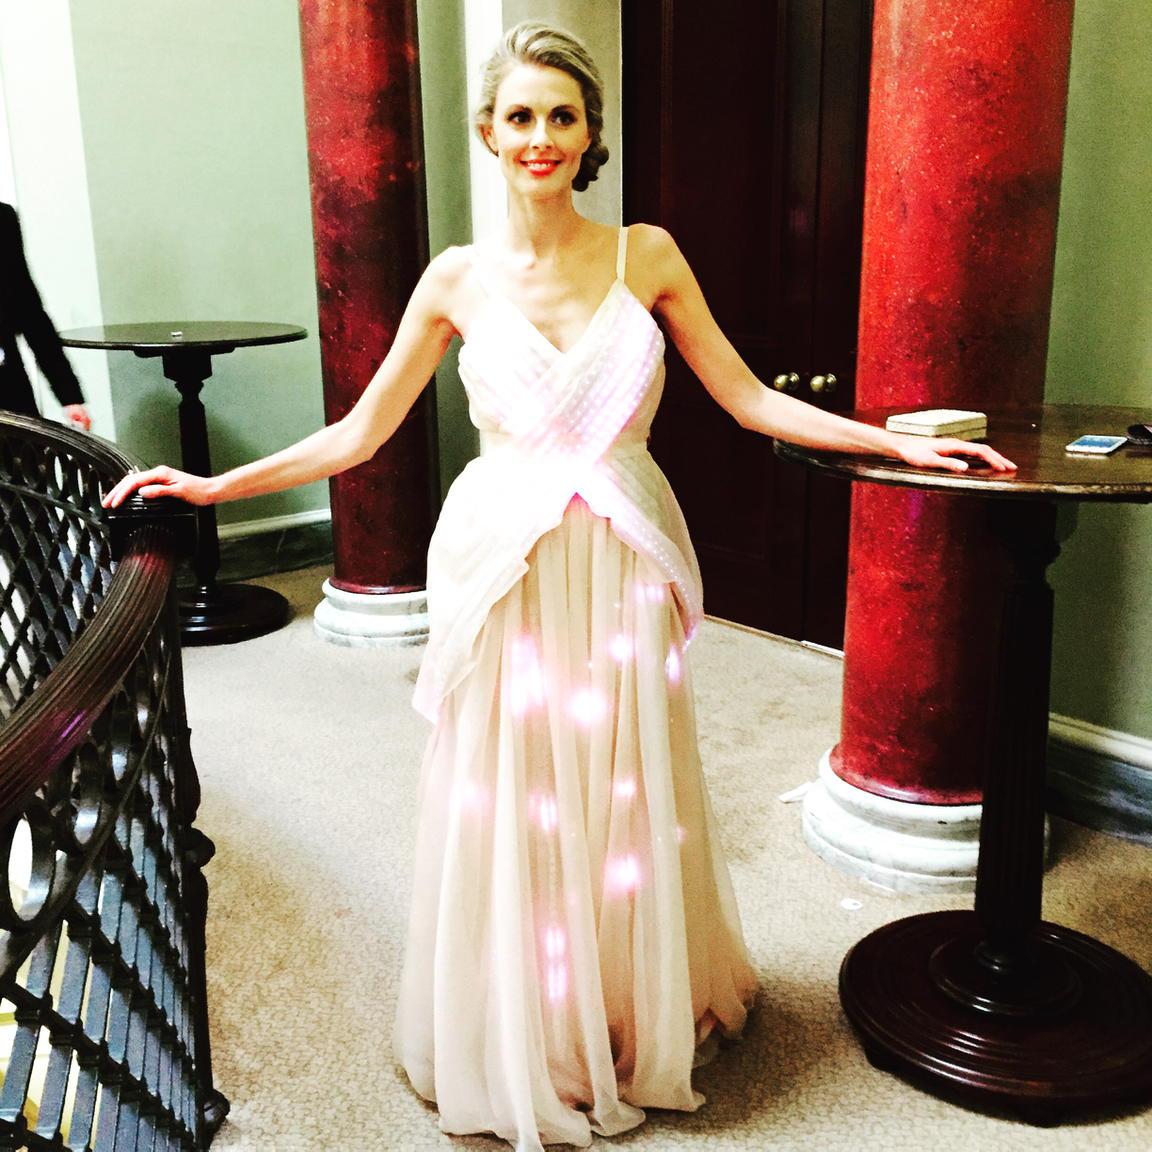 A team4 innovative dress @thisismimira @seeperarts @RebeccaStreet6 @1HQbrand agency @patfahy @baftatv @houseoffraser http://t.co/ReXCns5PT7